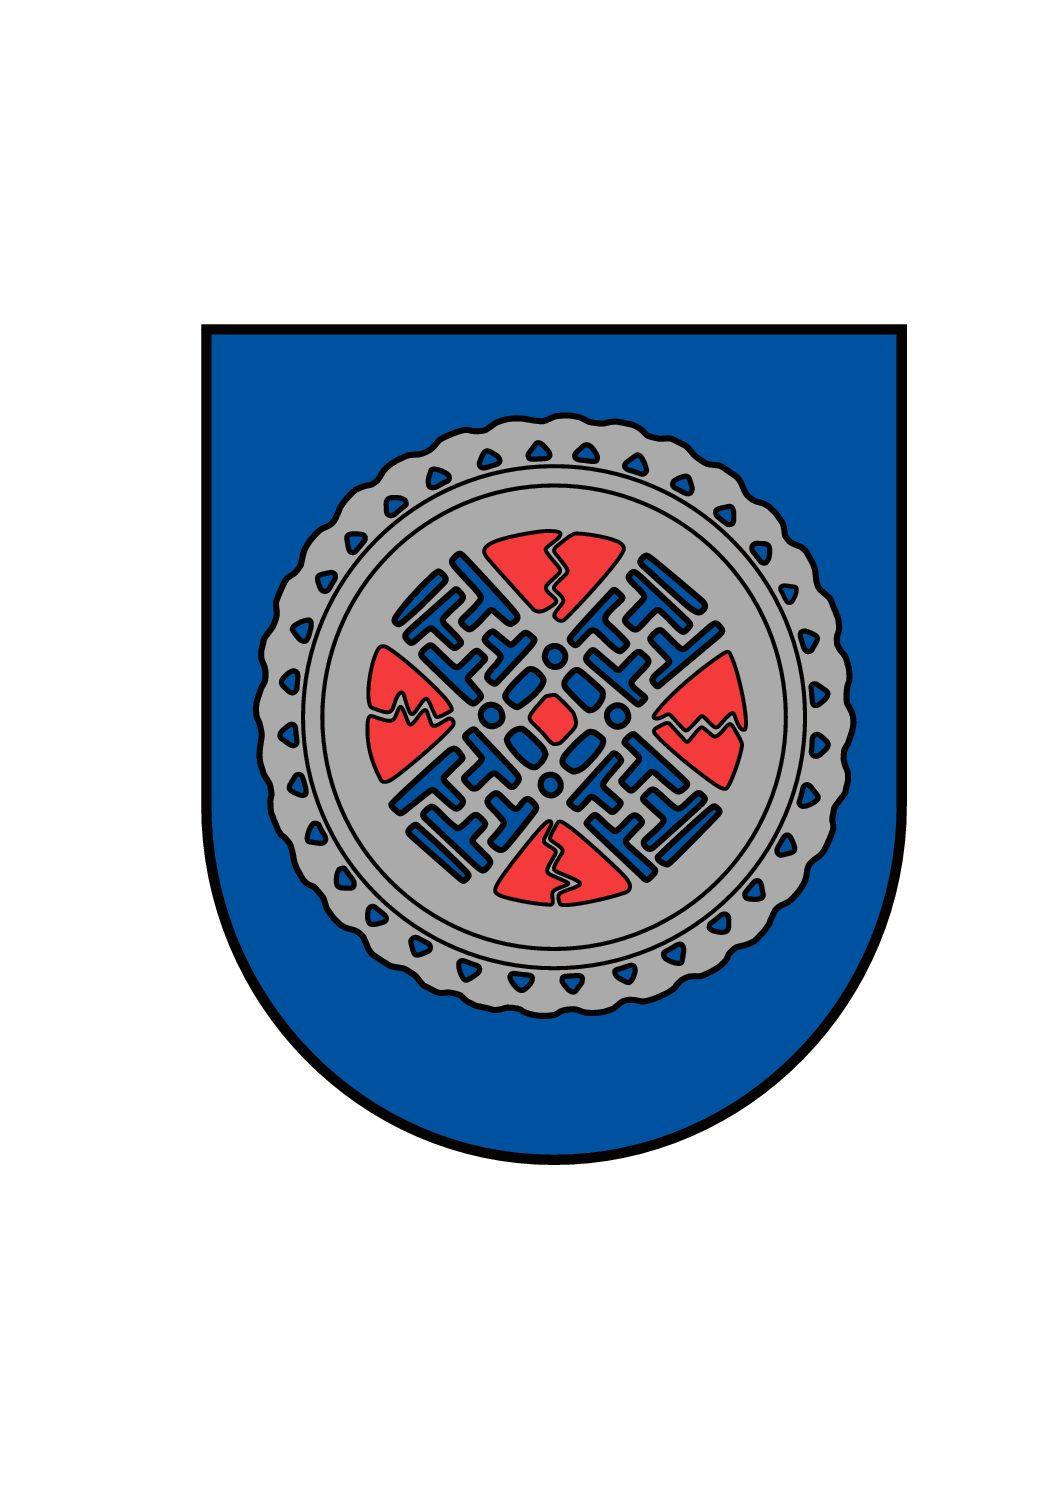 Beverina County Council